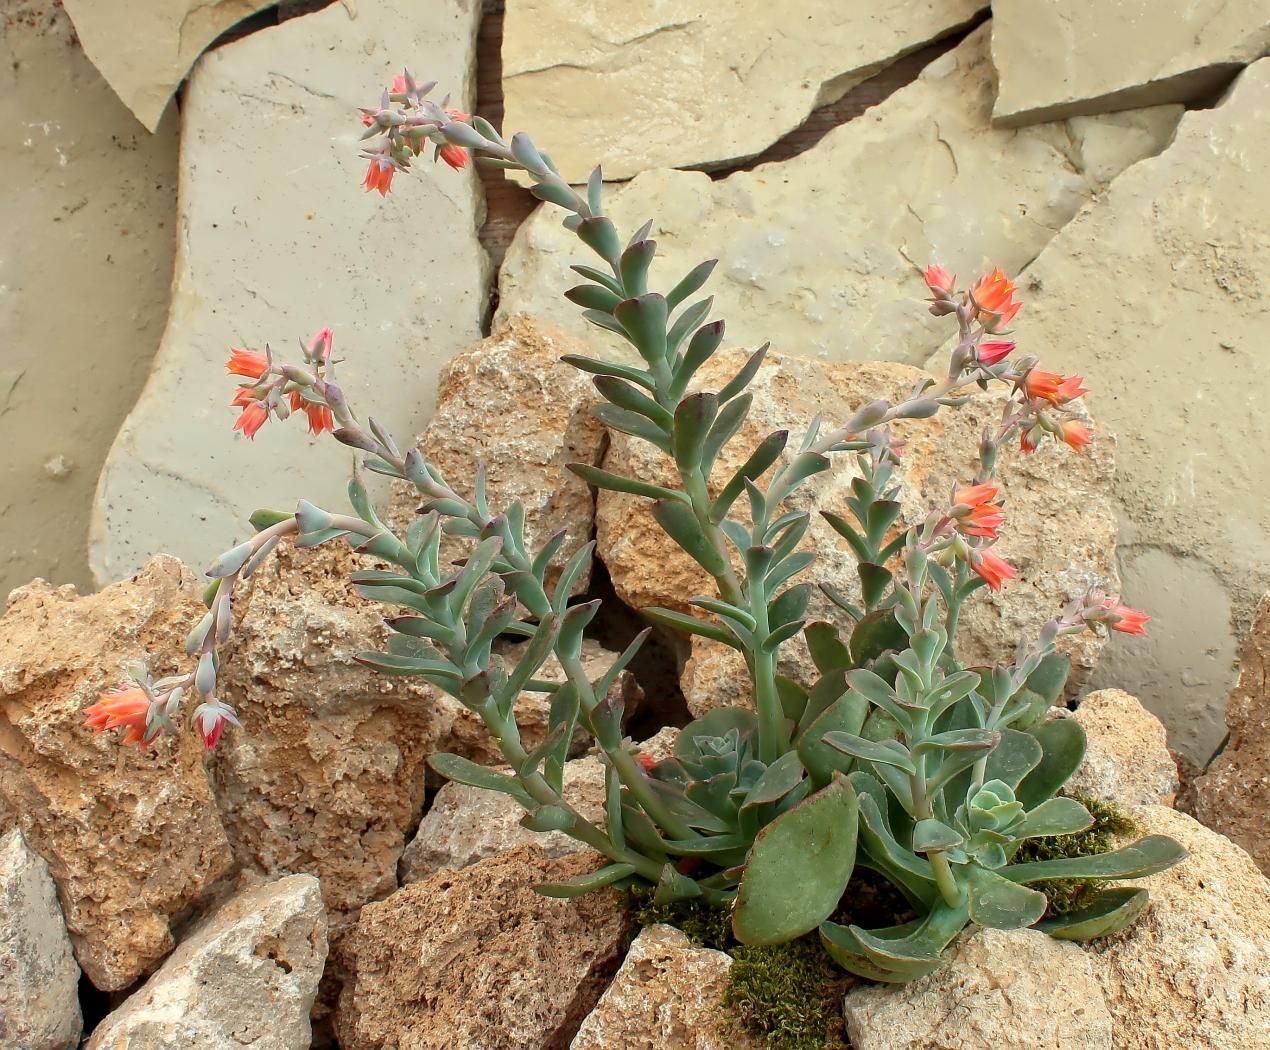 Echeveria-fulgens-var_-obtusifolia-2009-142-3925-3-3.jpeg